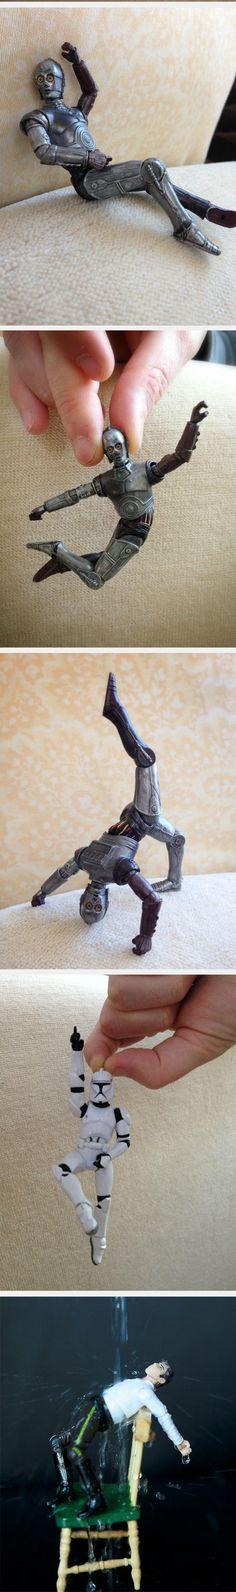 Star Wars Action Figures Dancing! - Last one is my fav!!